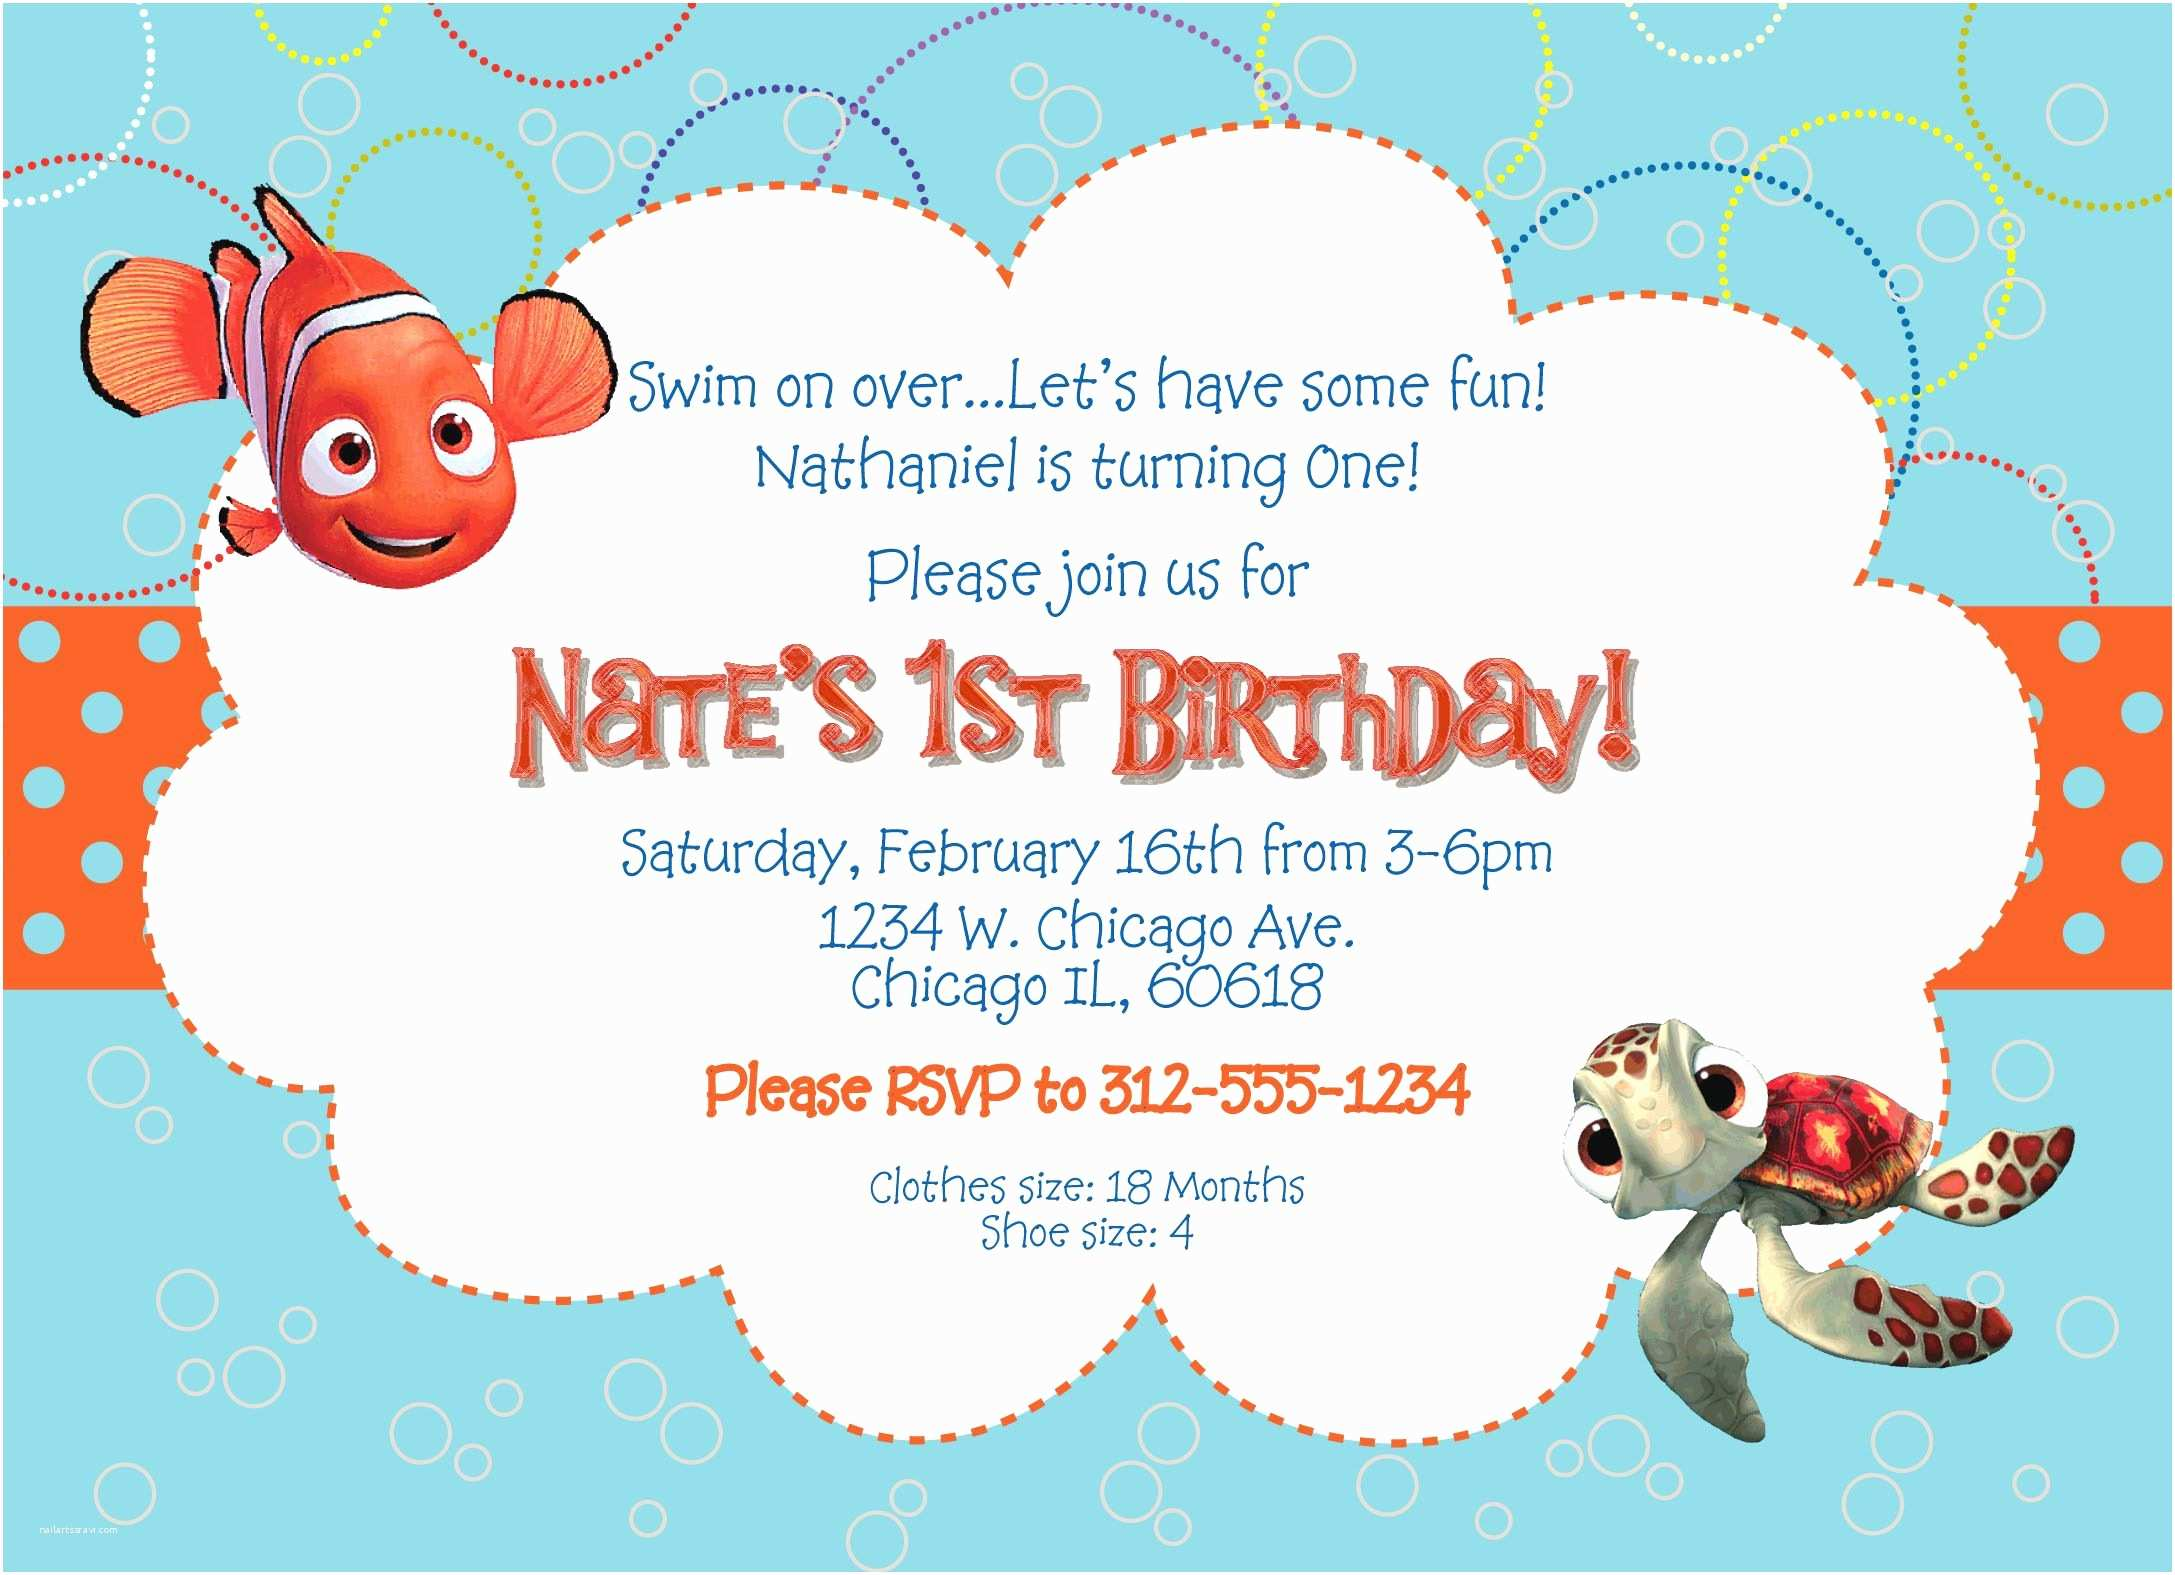 Finding Nemo Birthday Invitations Finding Nemo Birthday Invitations And Ideas How